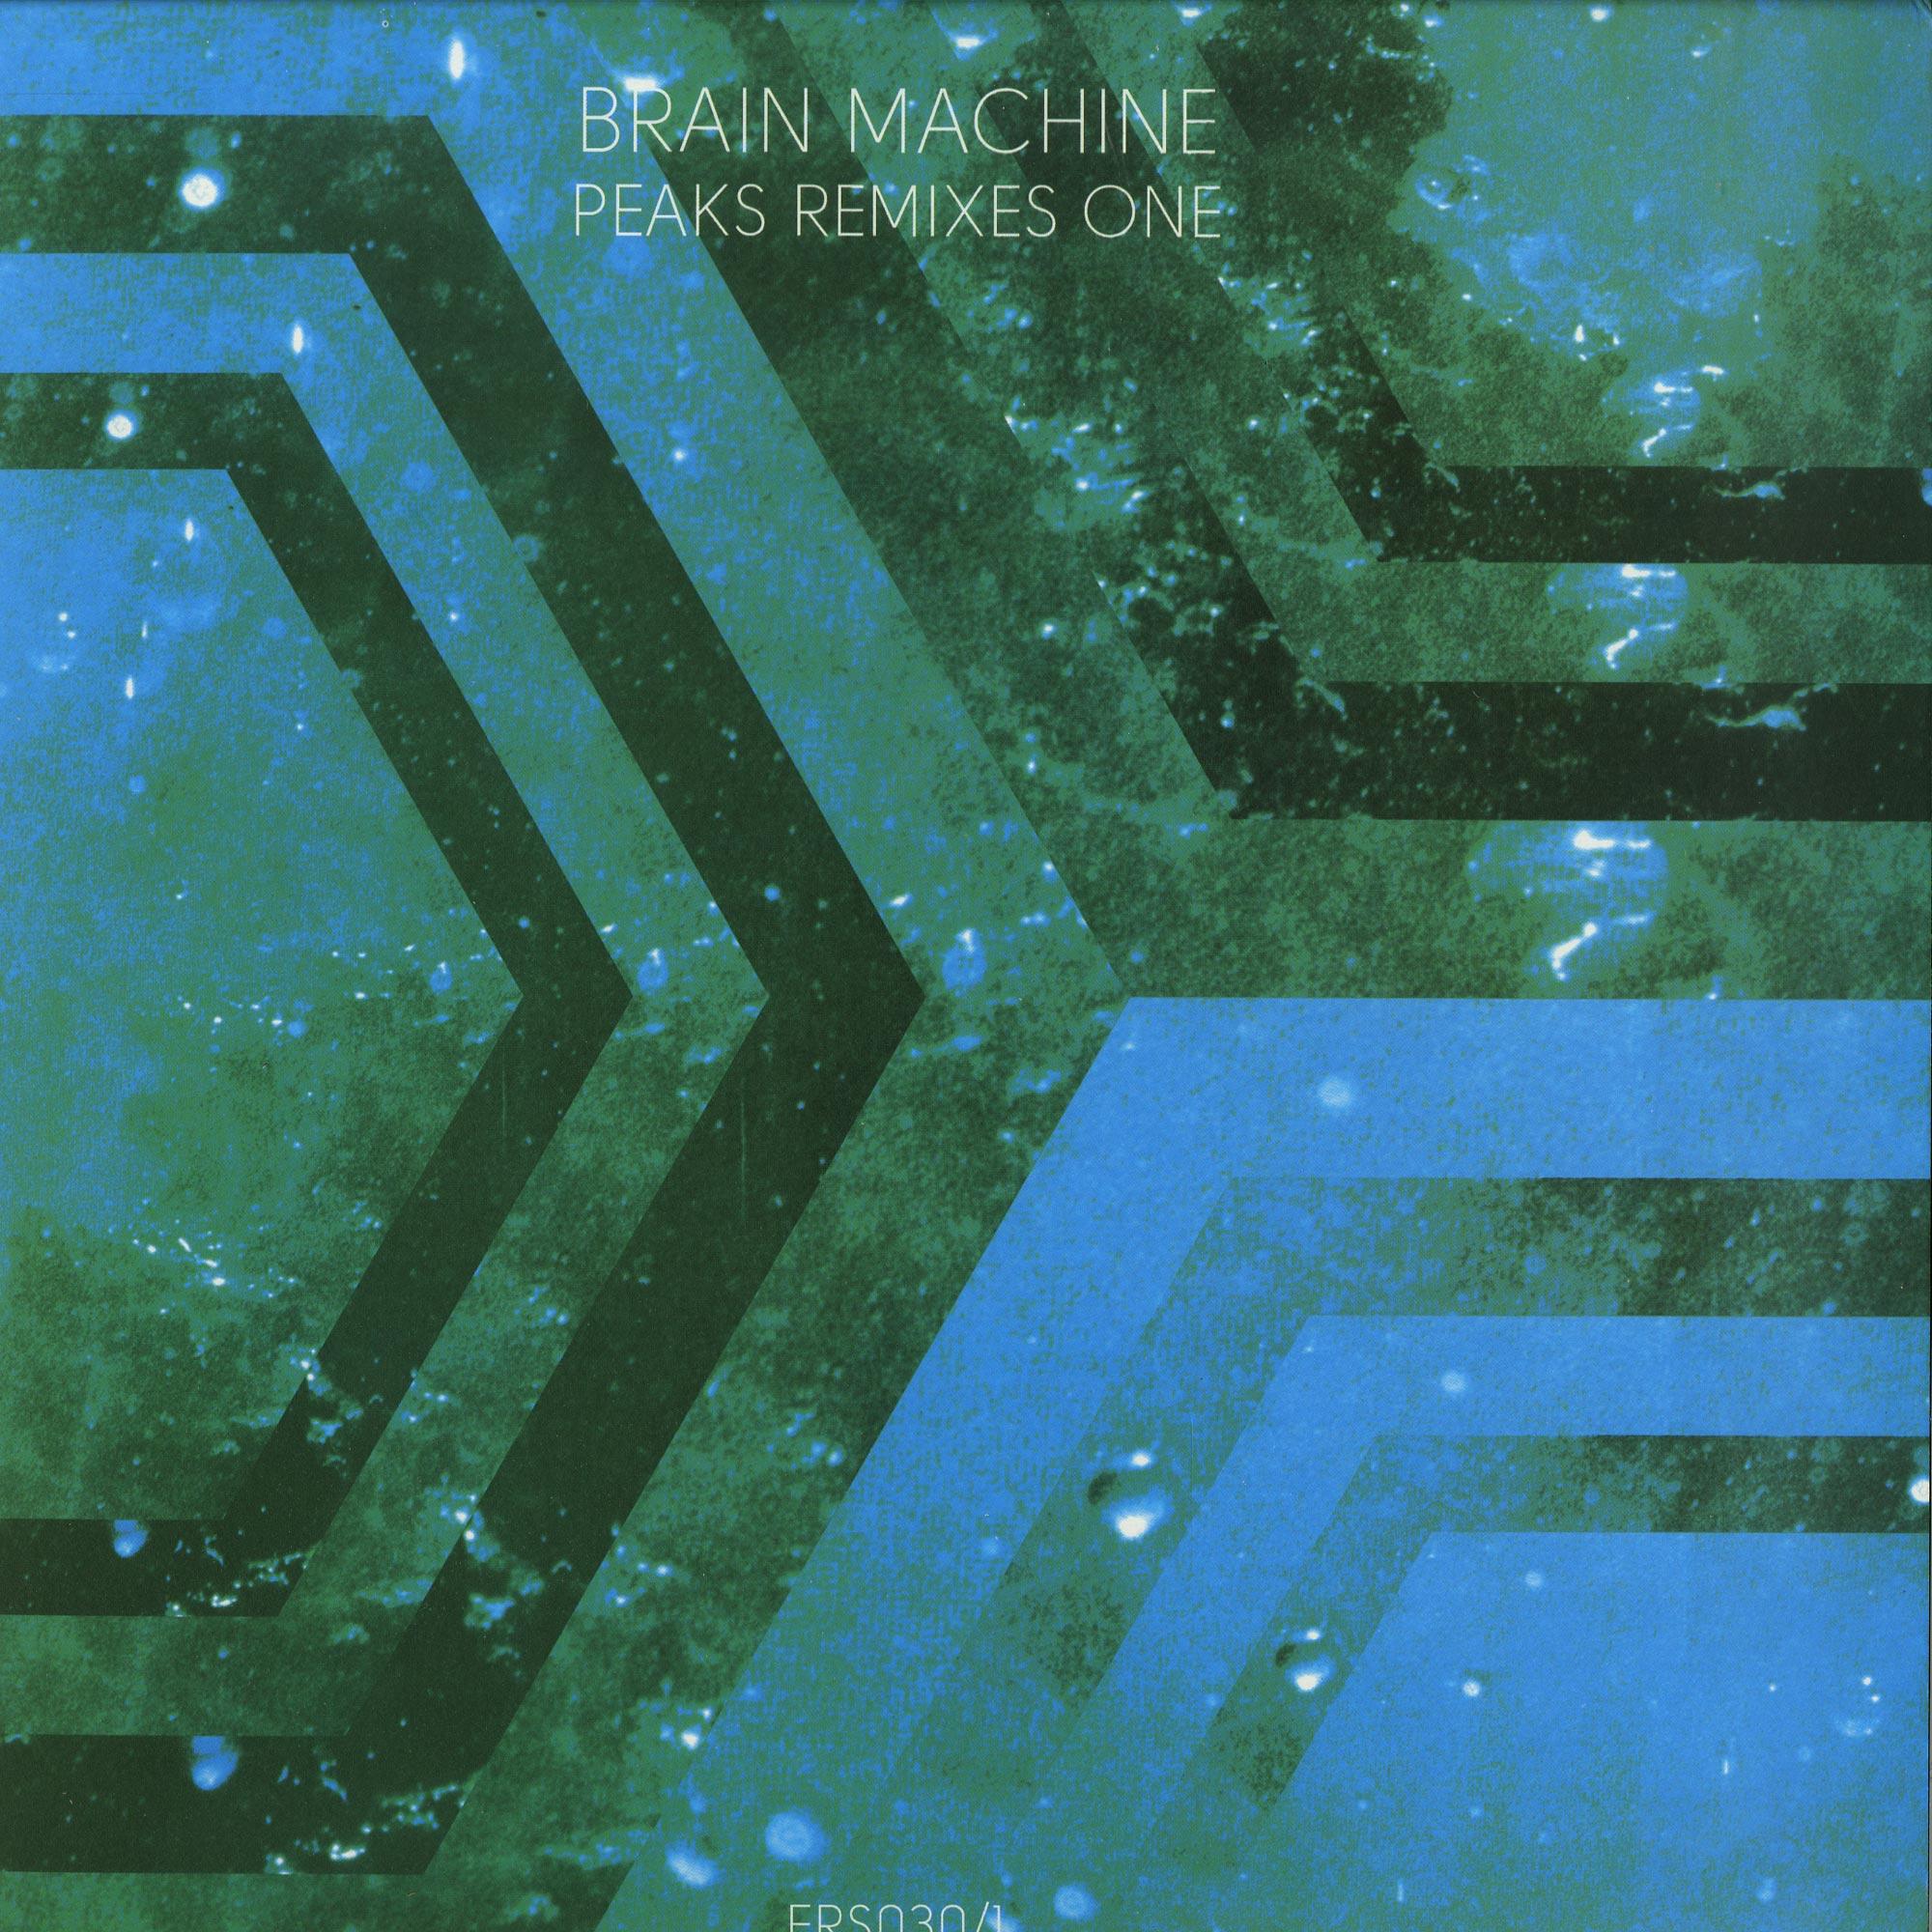 Brain Machine - PEAKS REMIXES ONE